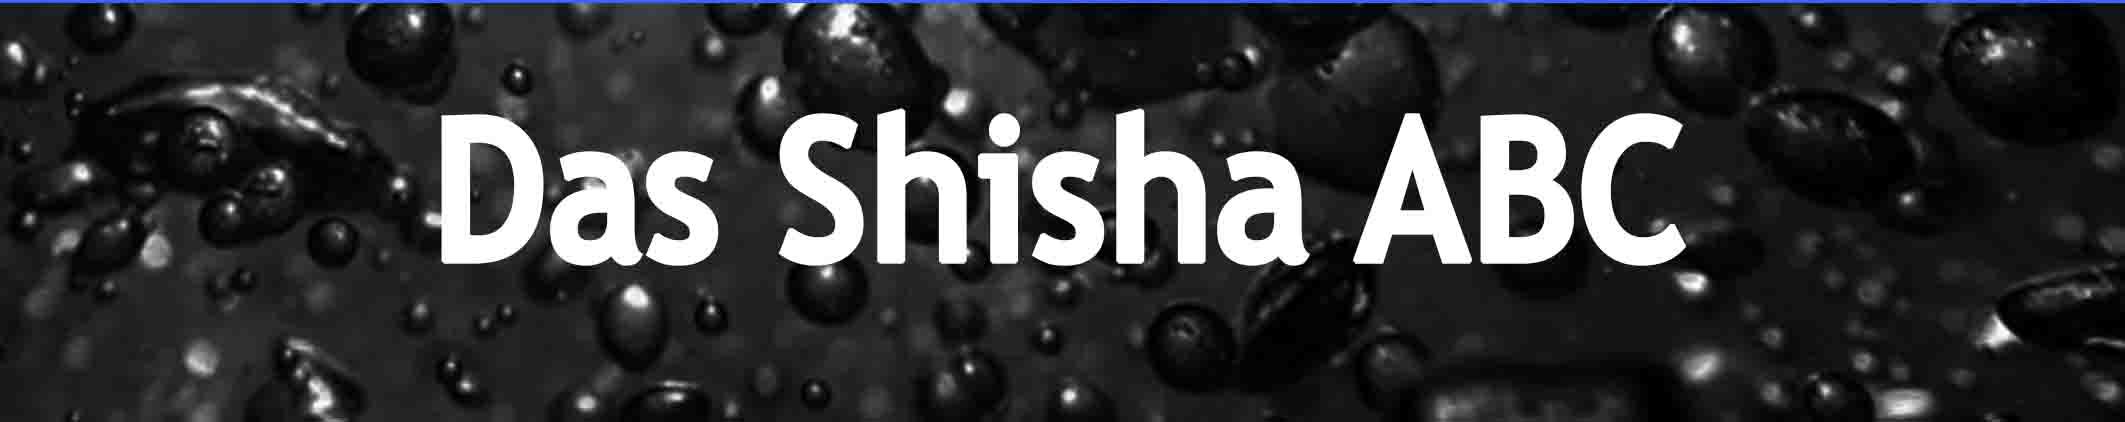 Wasserpfeife kaufen: shisha abc